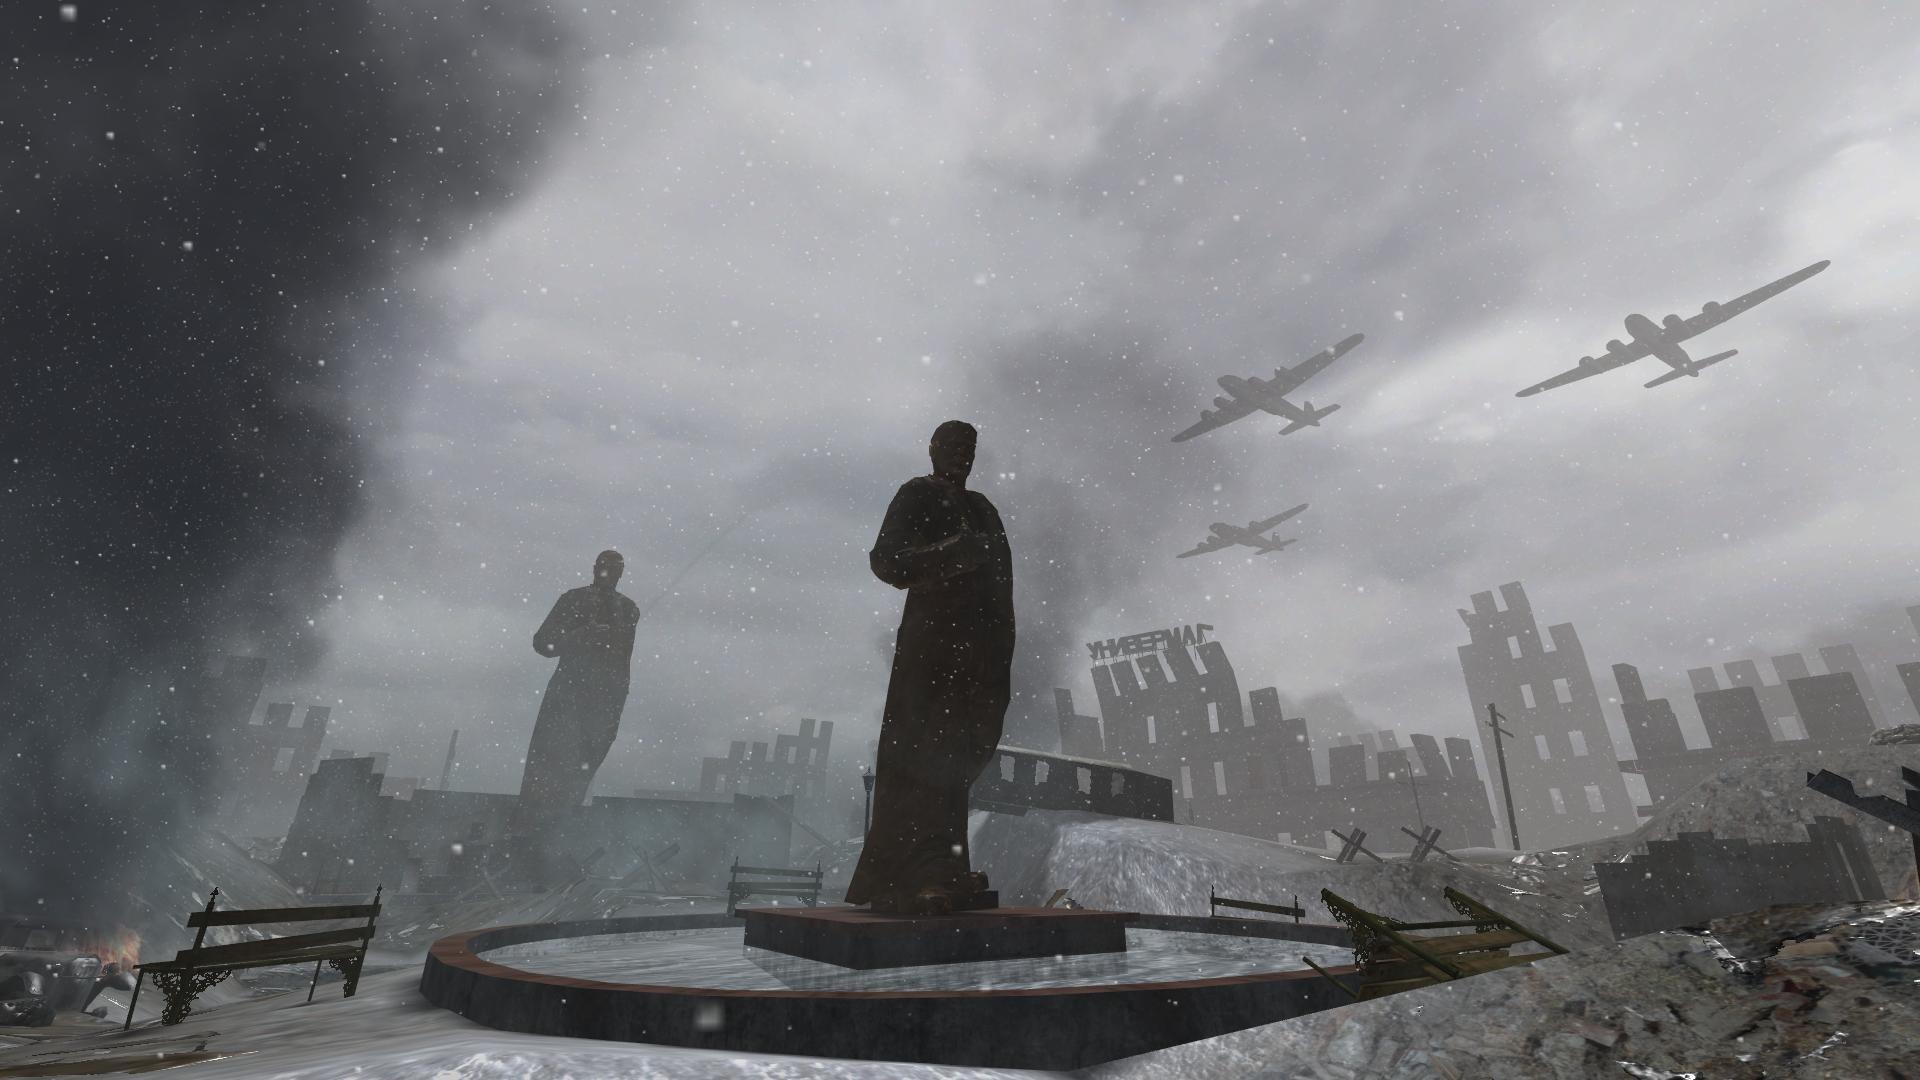 Redsquare Massacre NE [Call of Duty 2 ] [Maps] 1920x1080